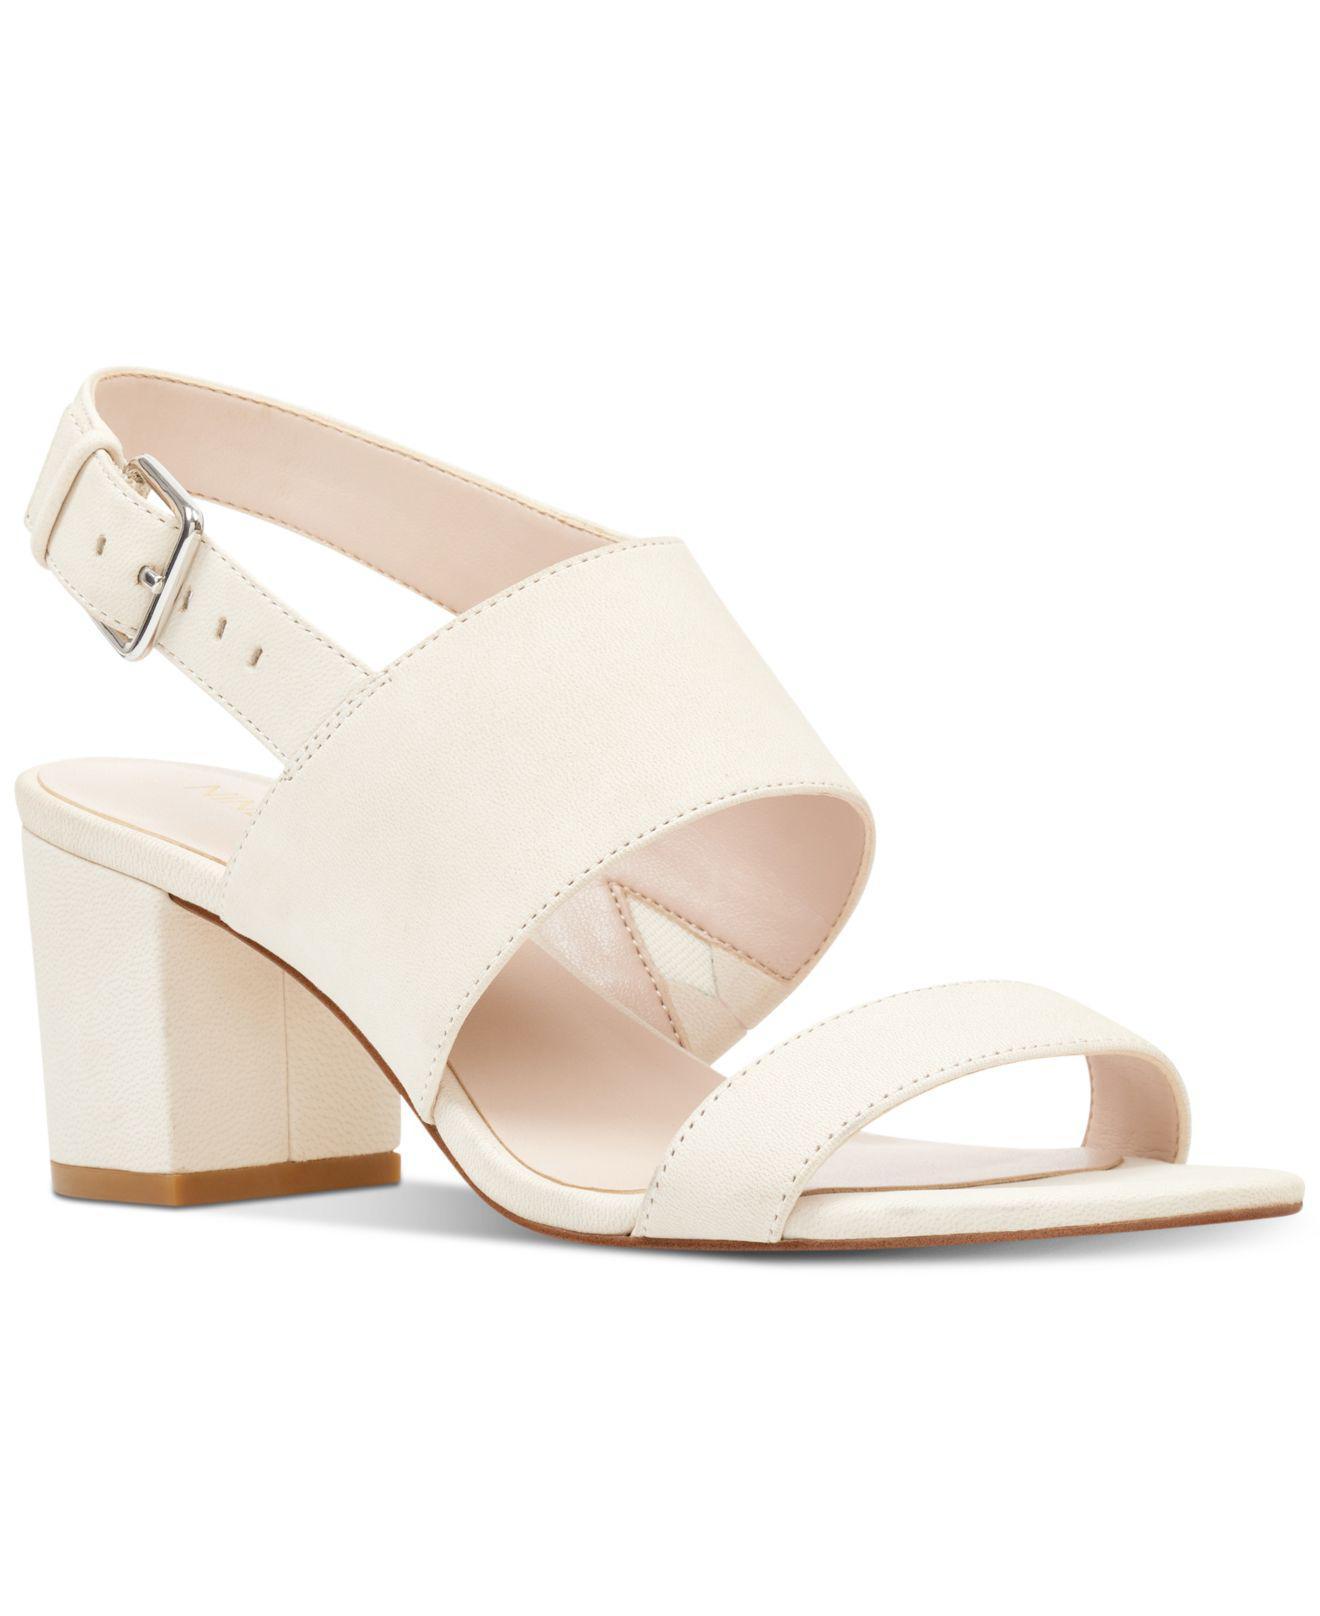 Nine West Women's Forli Asymmetrical Sandal bgwMC6S8K